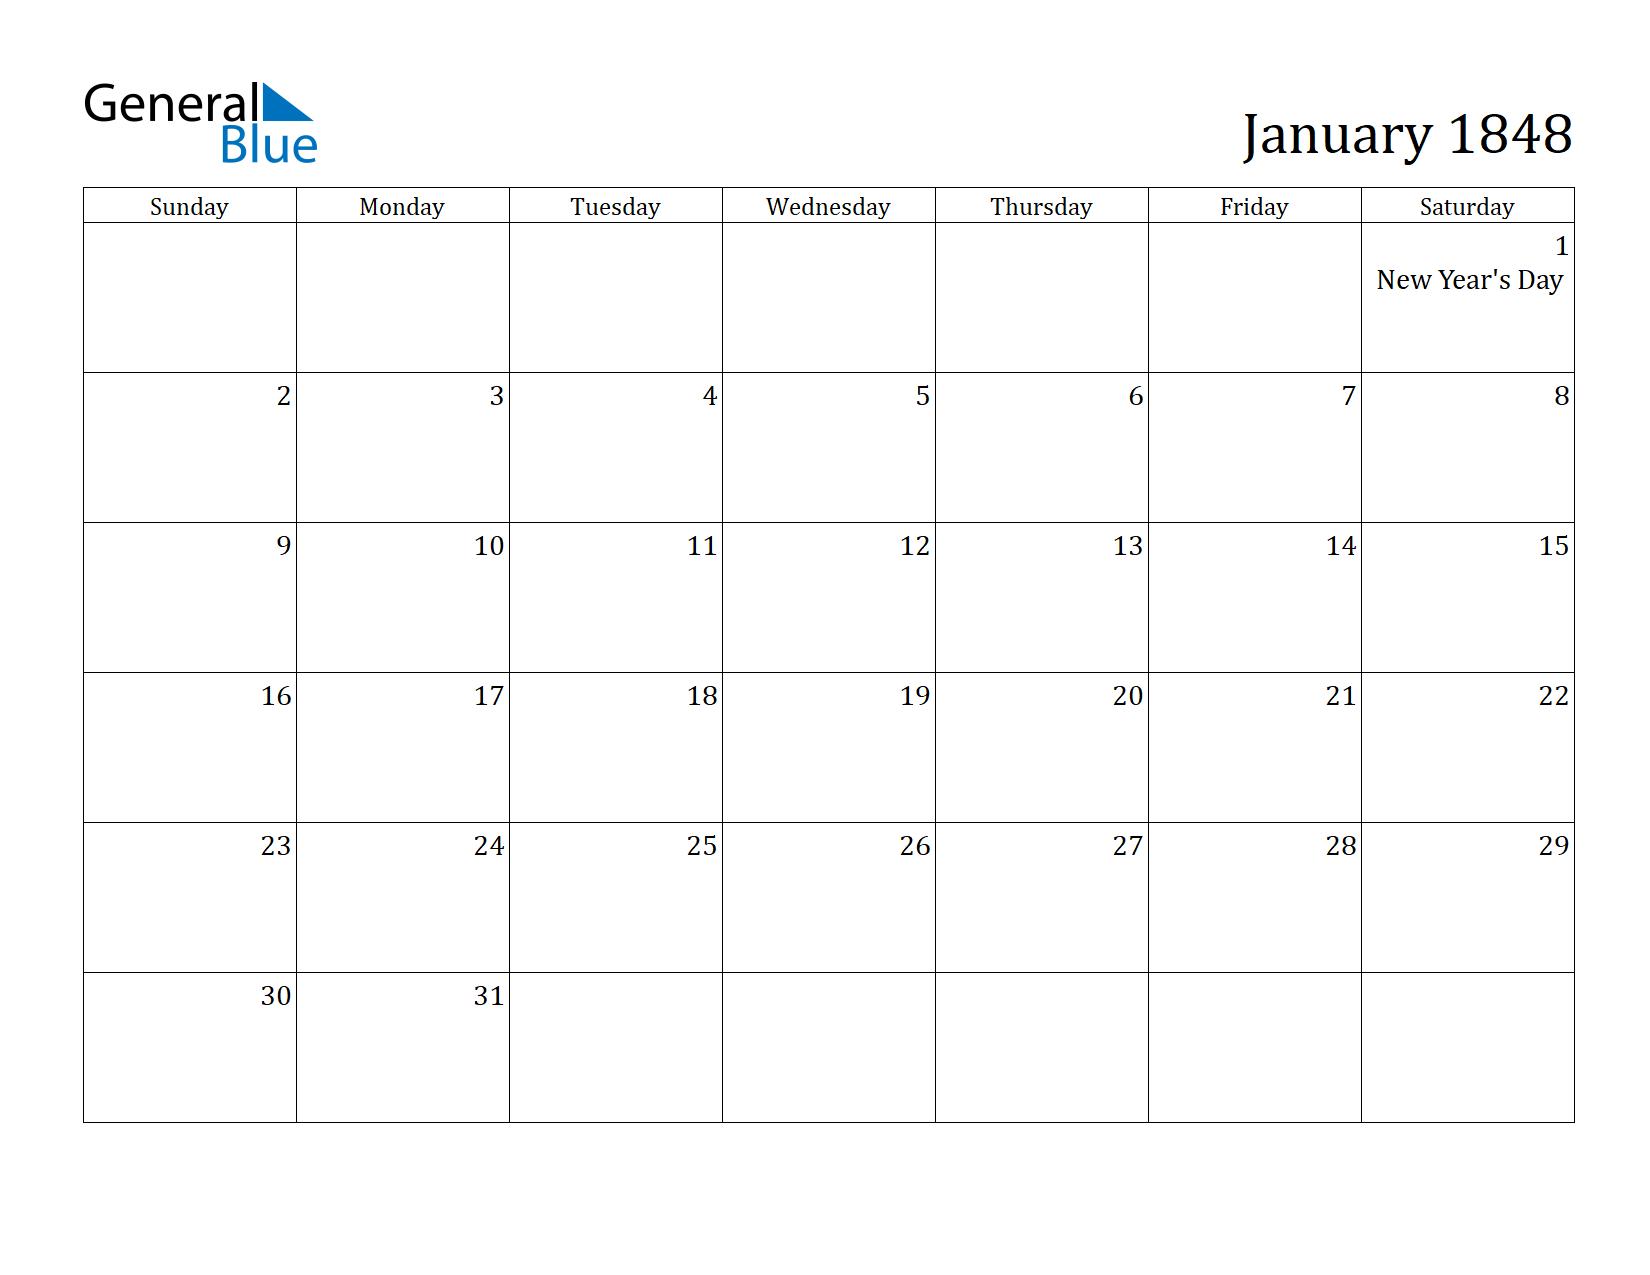 Image of January 1848 Calendar